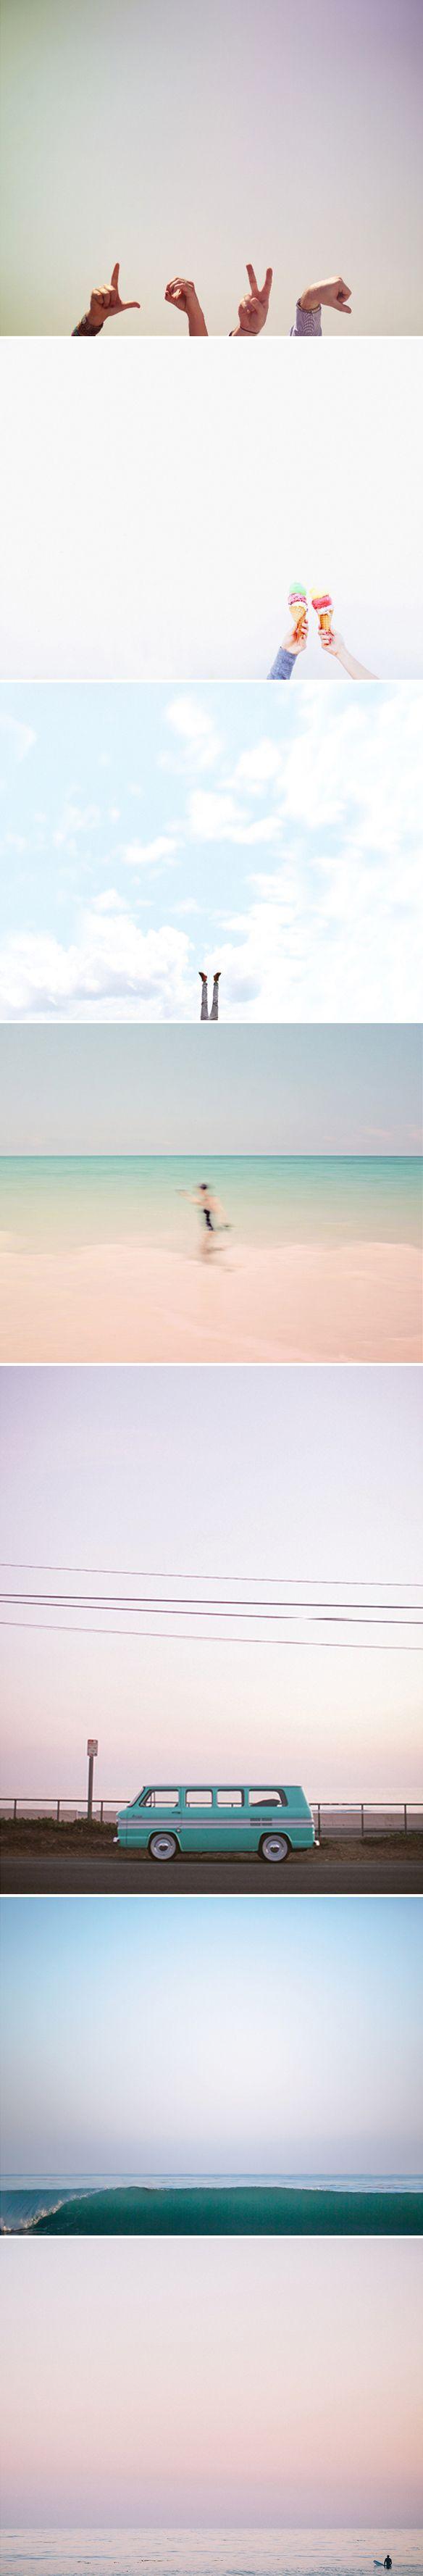 Max Wanger via thejealouscurator #Photography